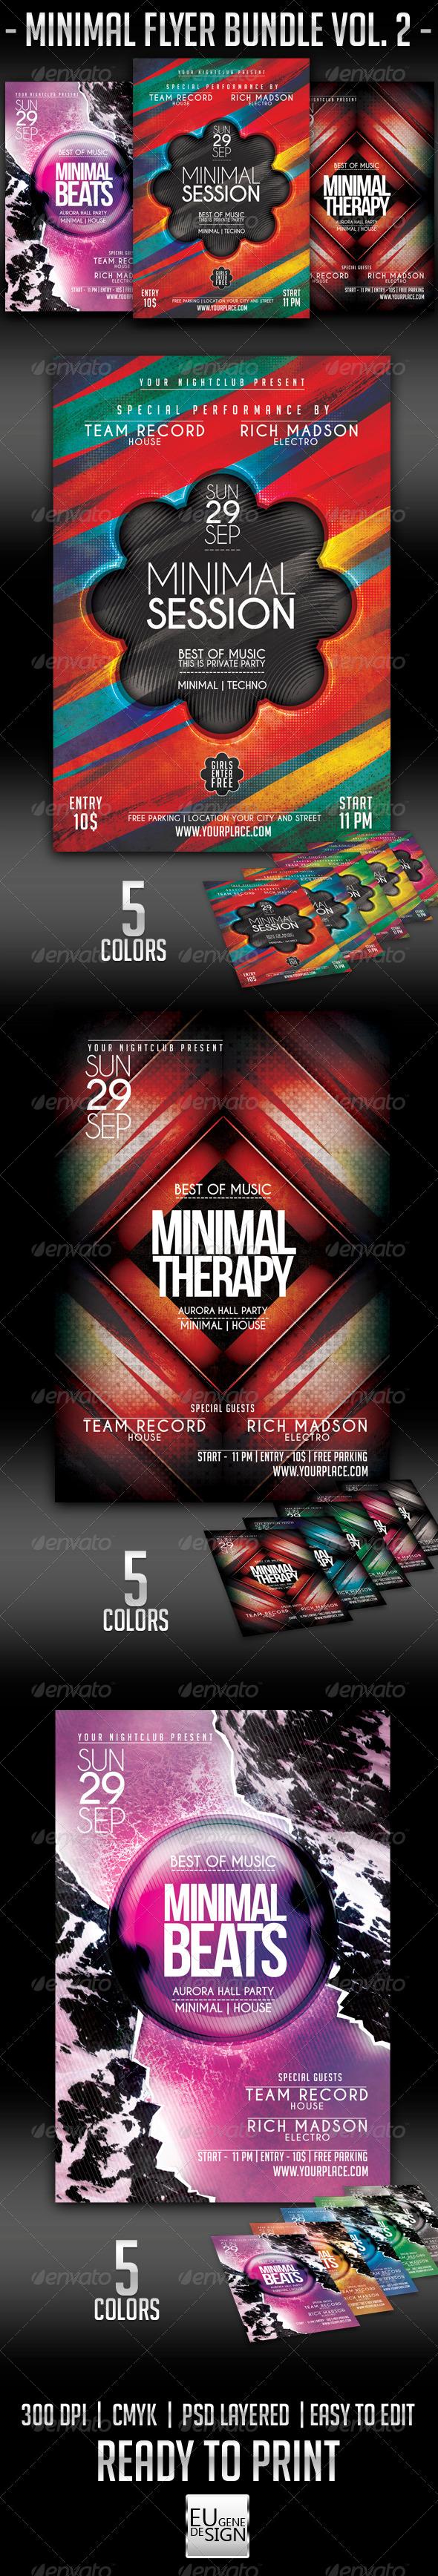 Minimal Flyer Bundle Vol.2 - Clubs & Parties Events